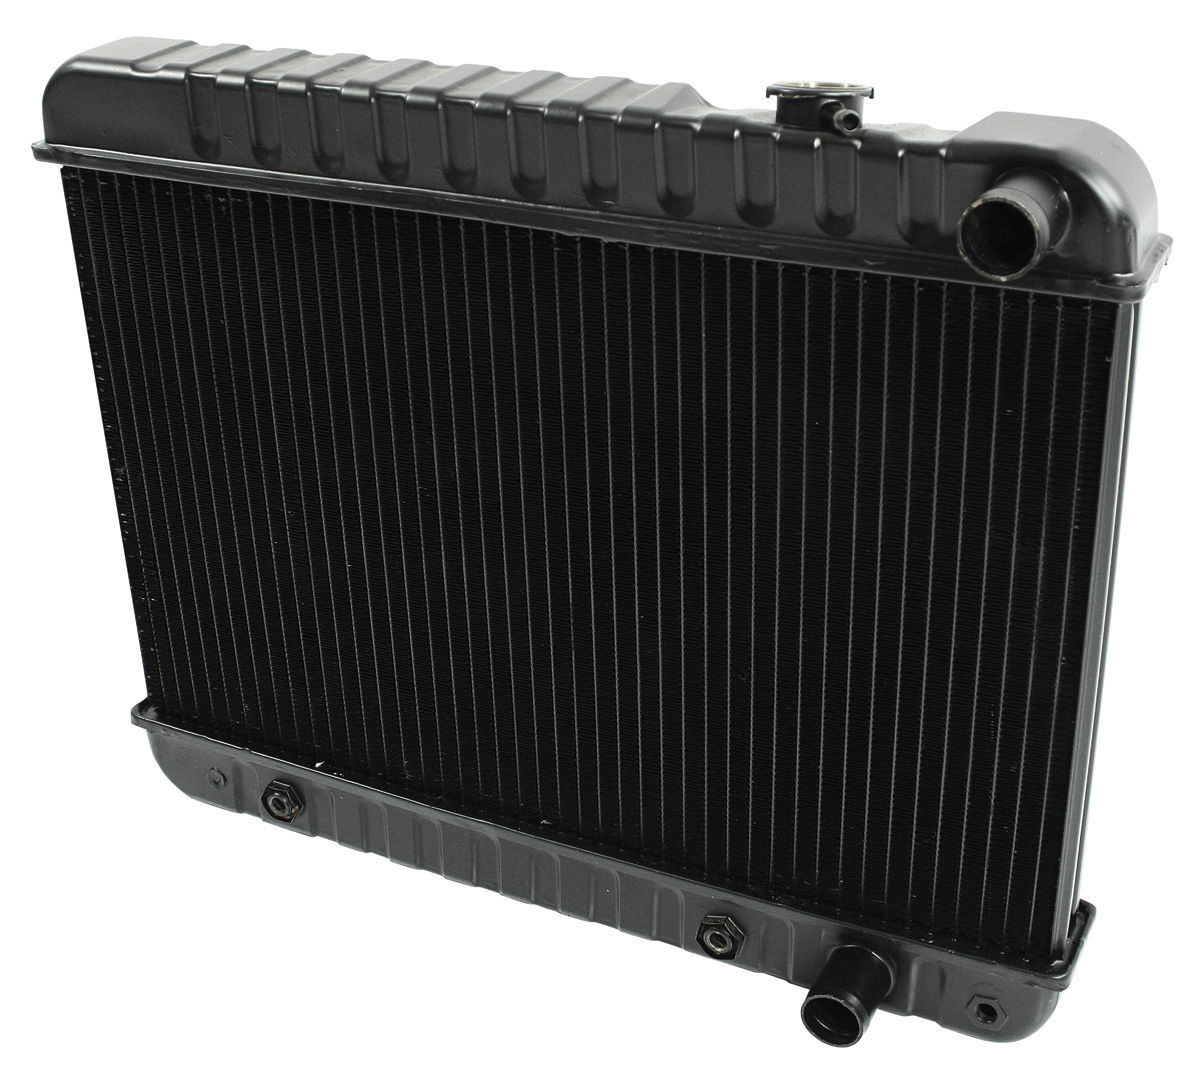 "Radiator, 1961-63 Skylark, V8, Automatic, 3-Row, 12-3/8"" X 23-1/8"" X 2"""